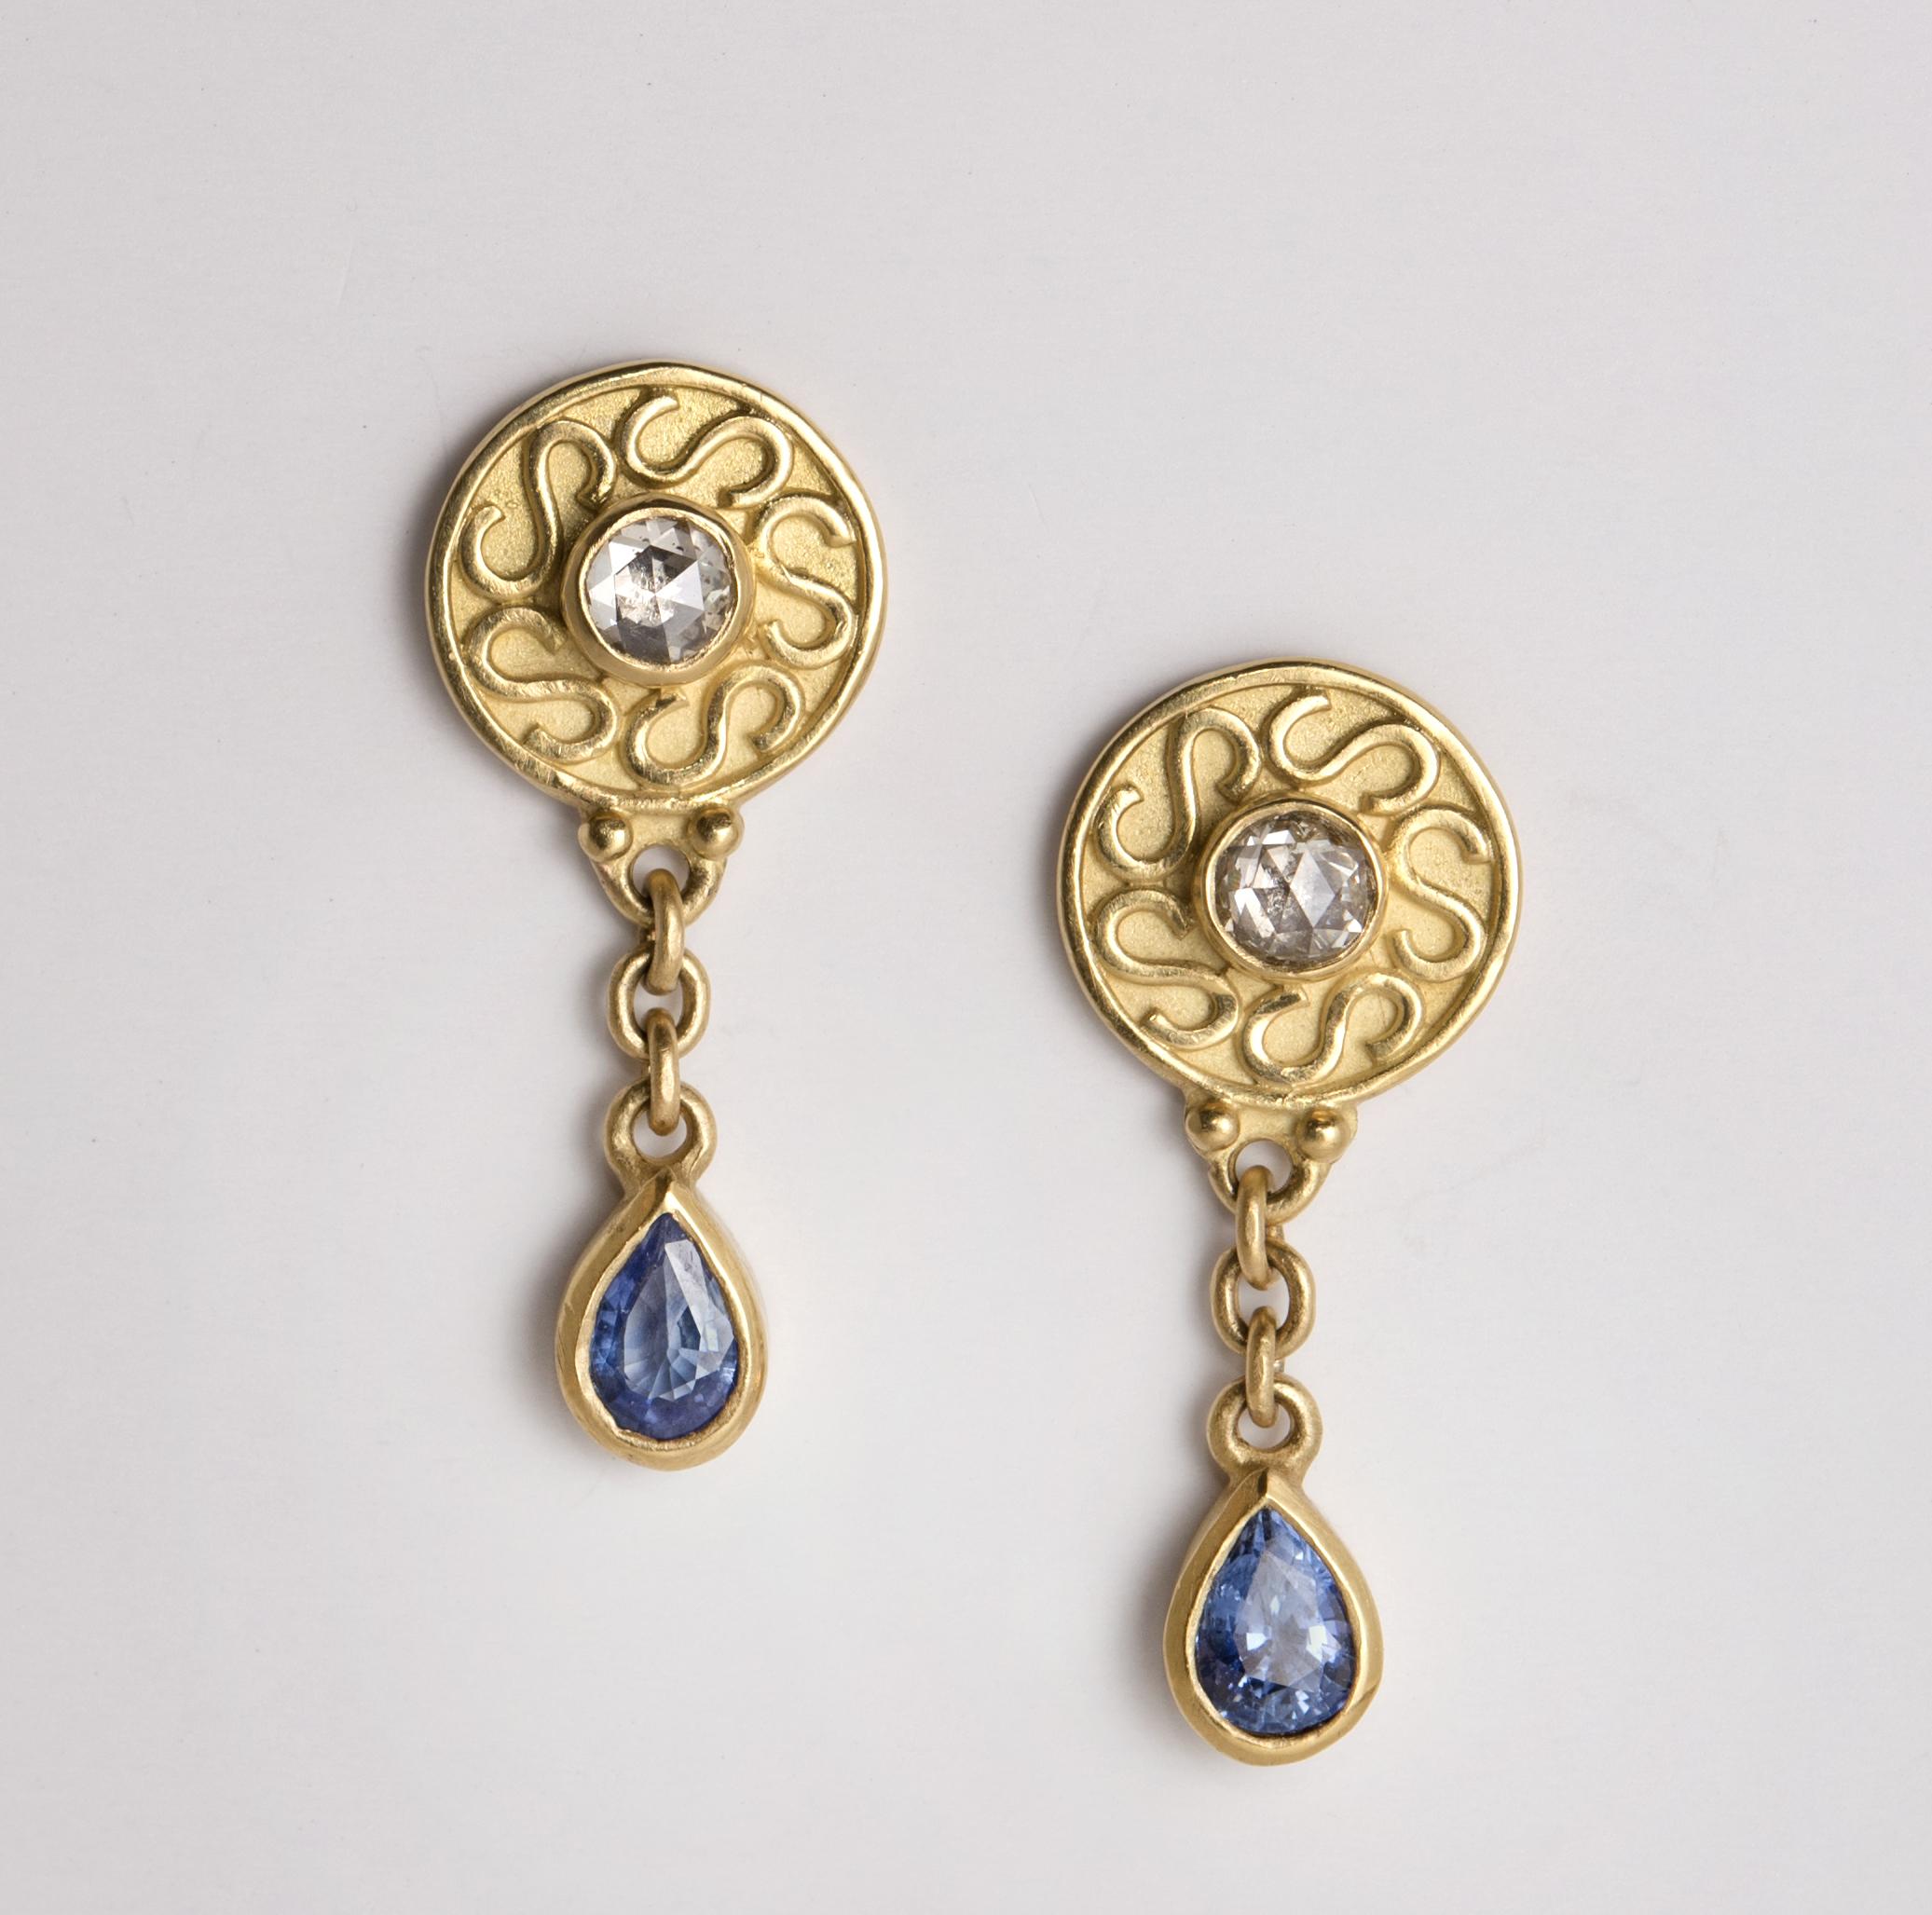 20K Rose Cut Diamond and Sapphire Earrings